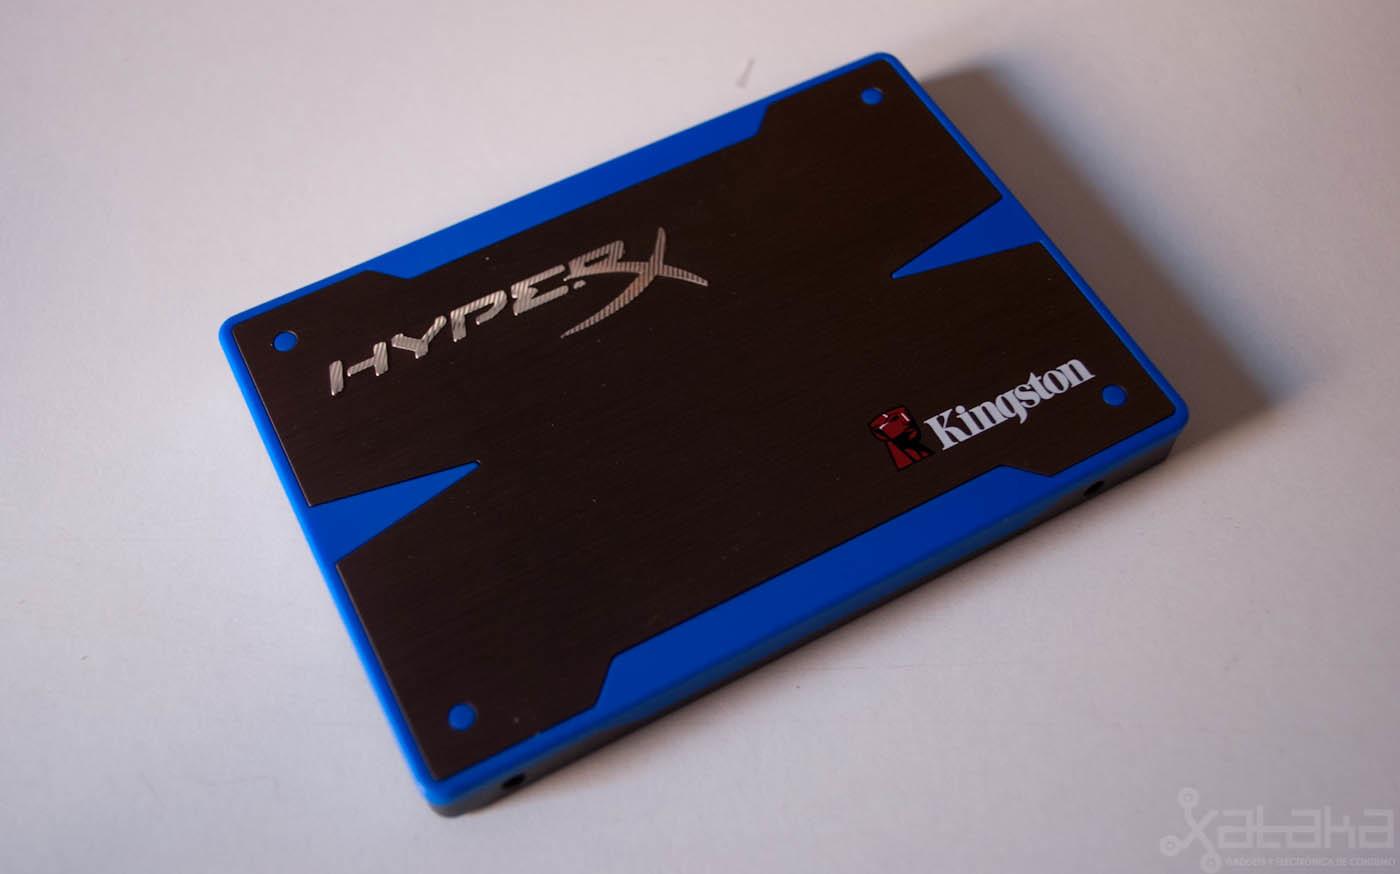 Foto de iKngston HyperX SSD, análisis (5/11)